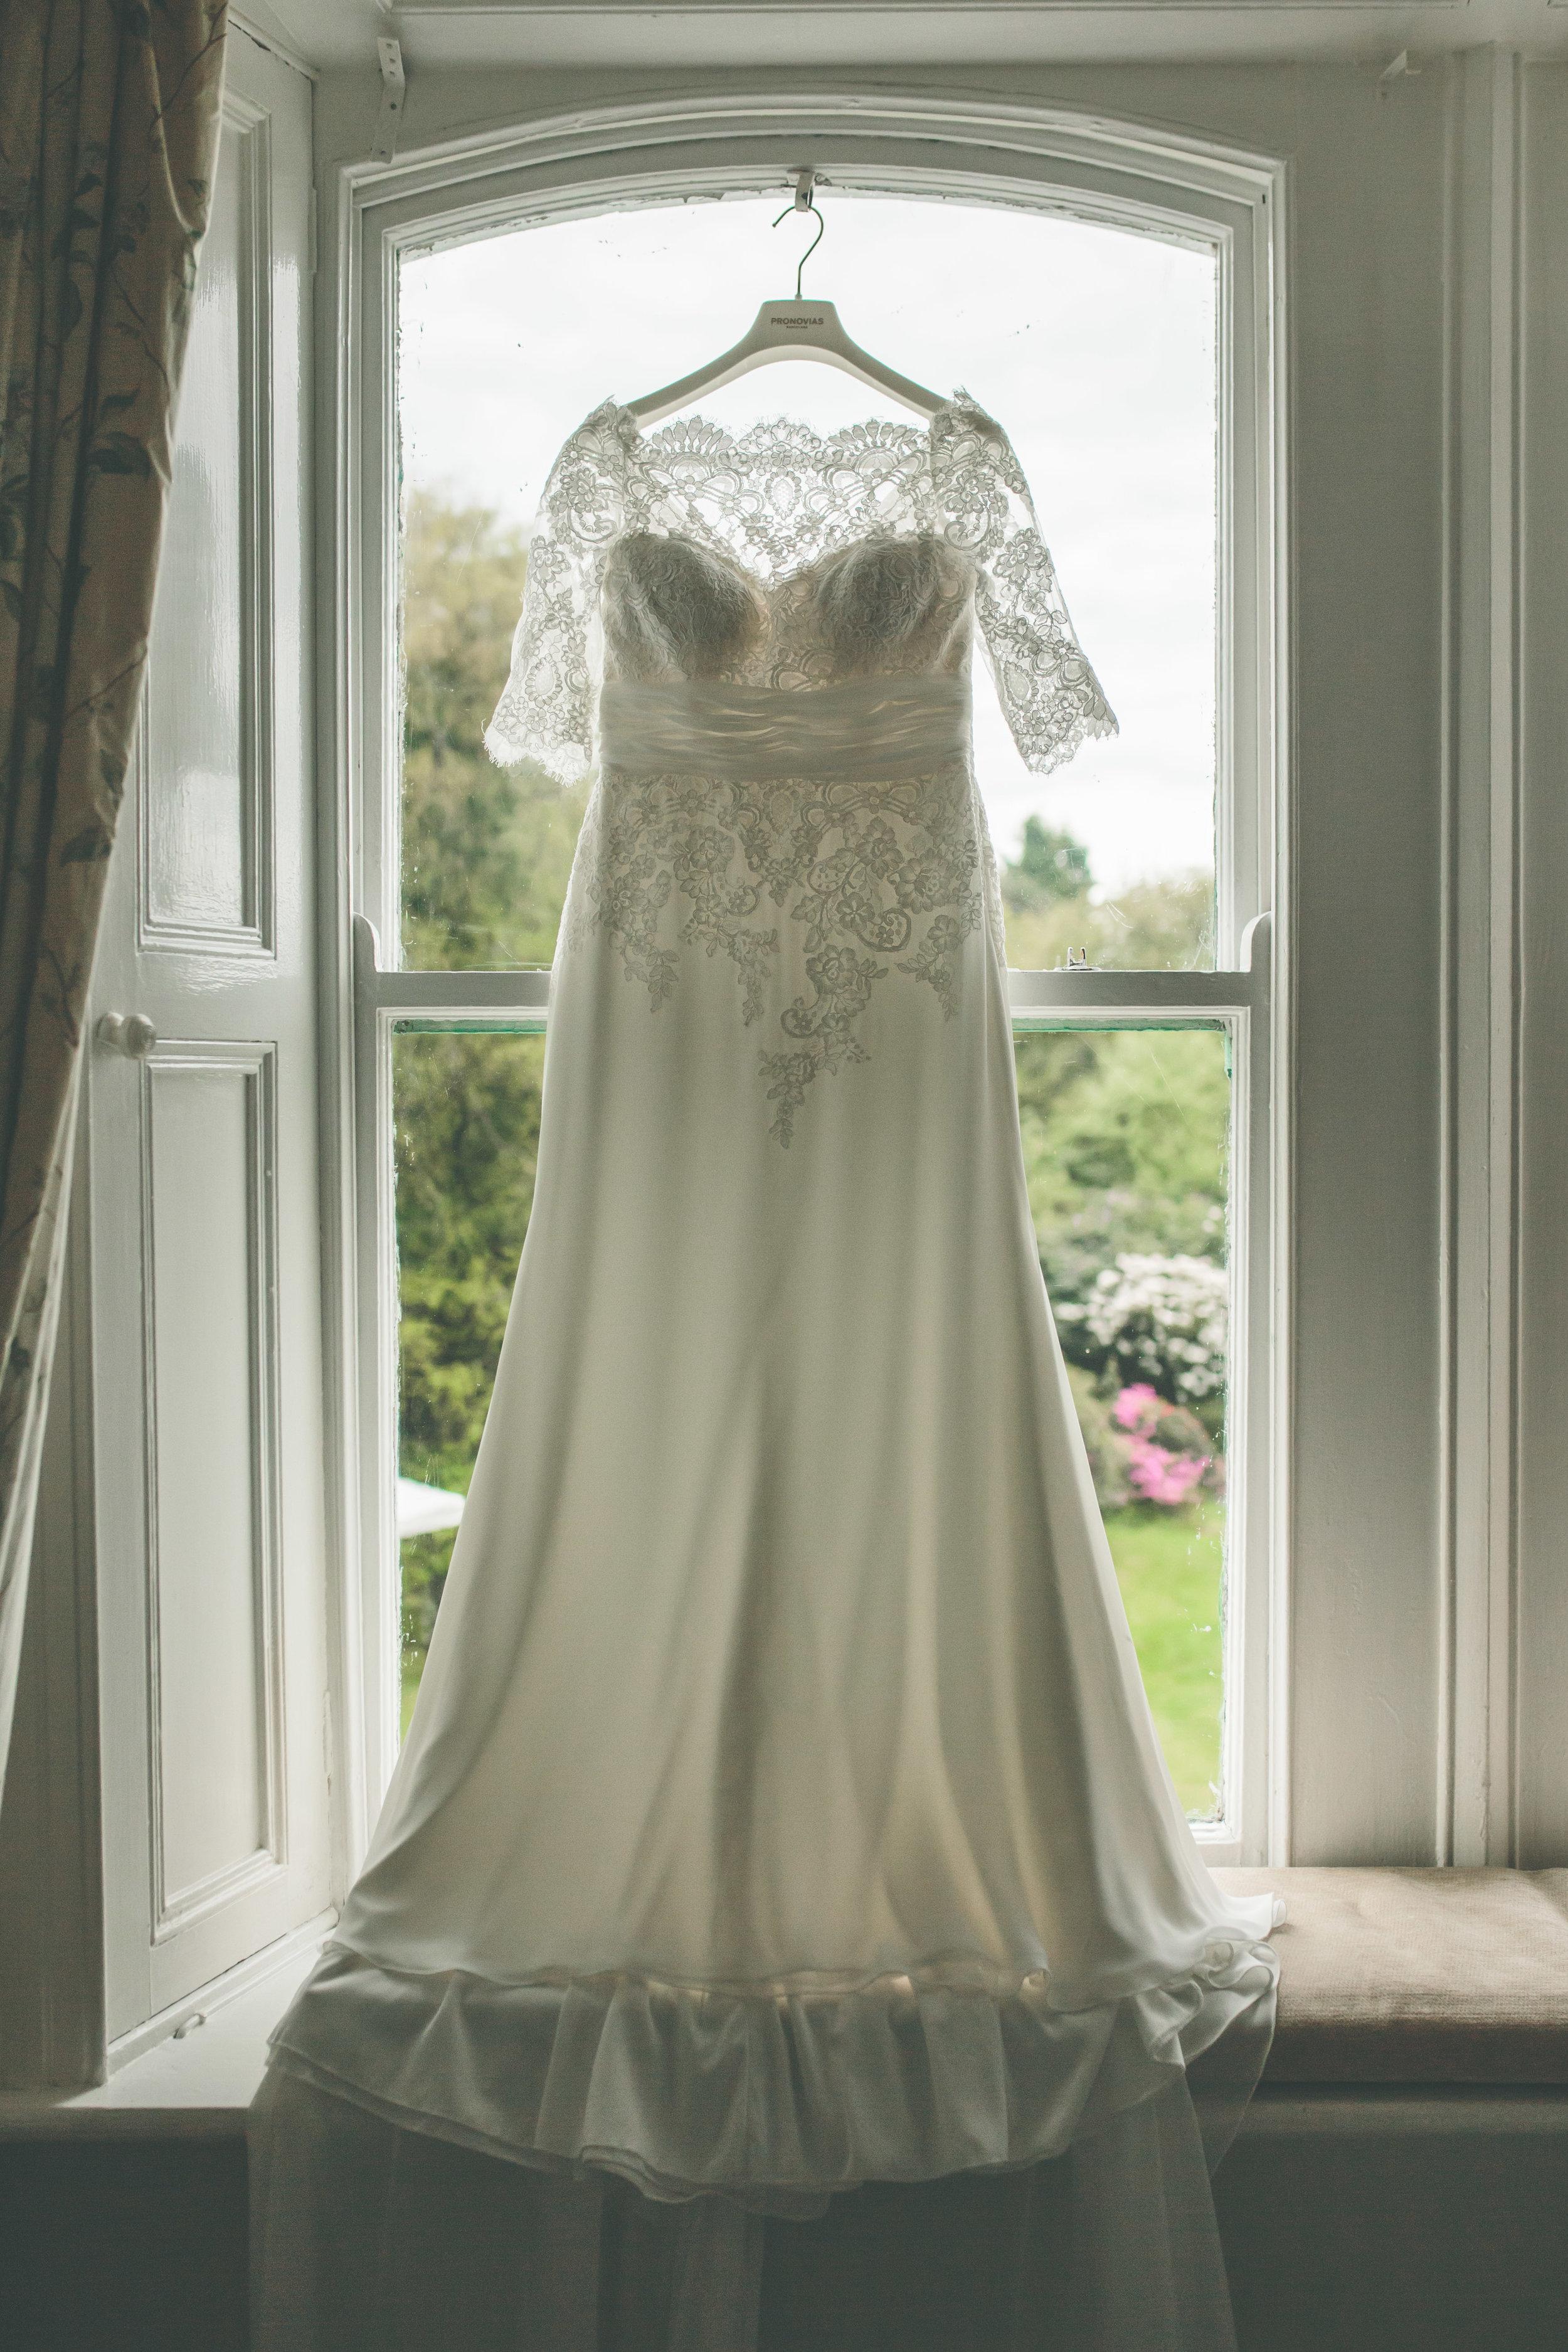 Wedding dress window, Cashel House Hotel photography